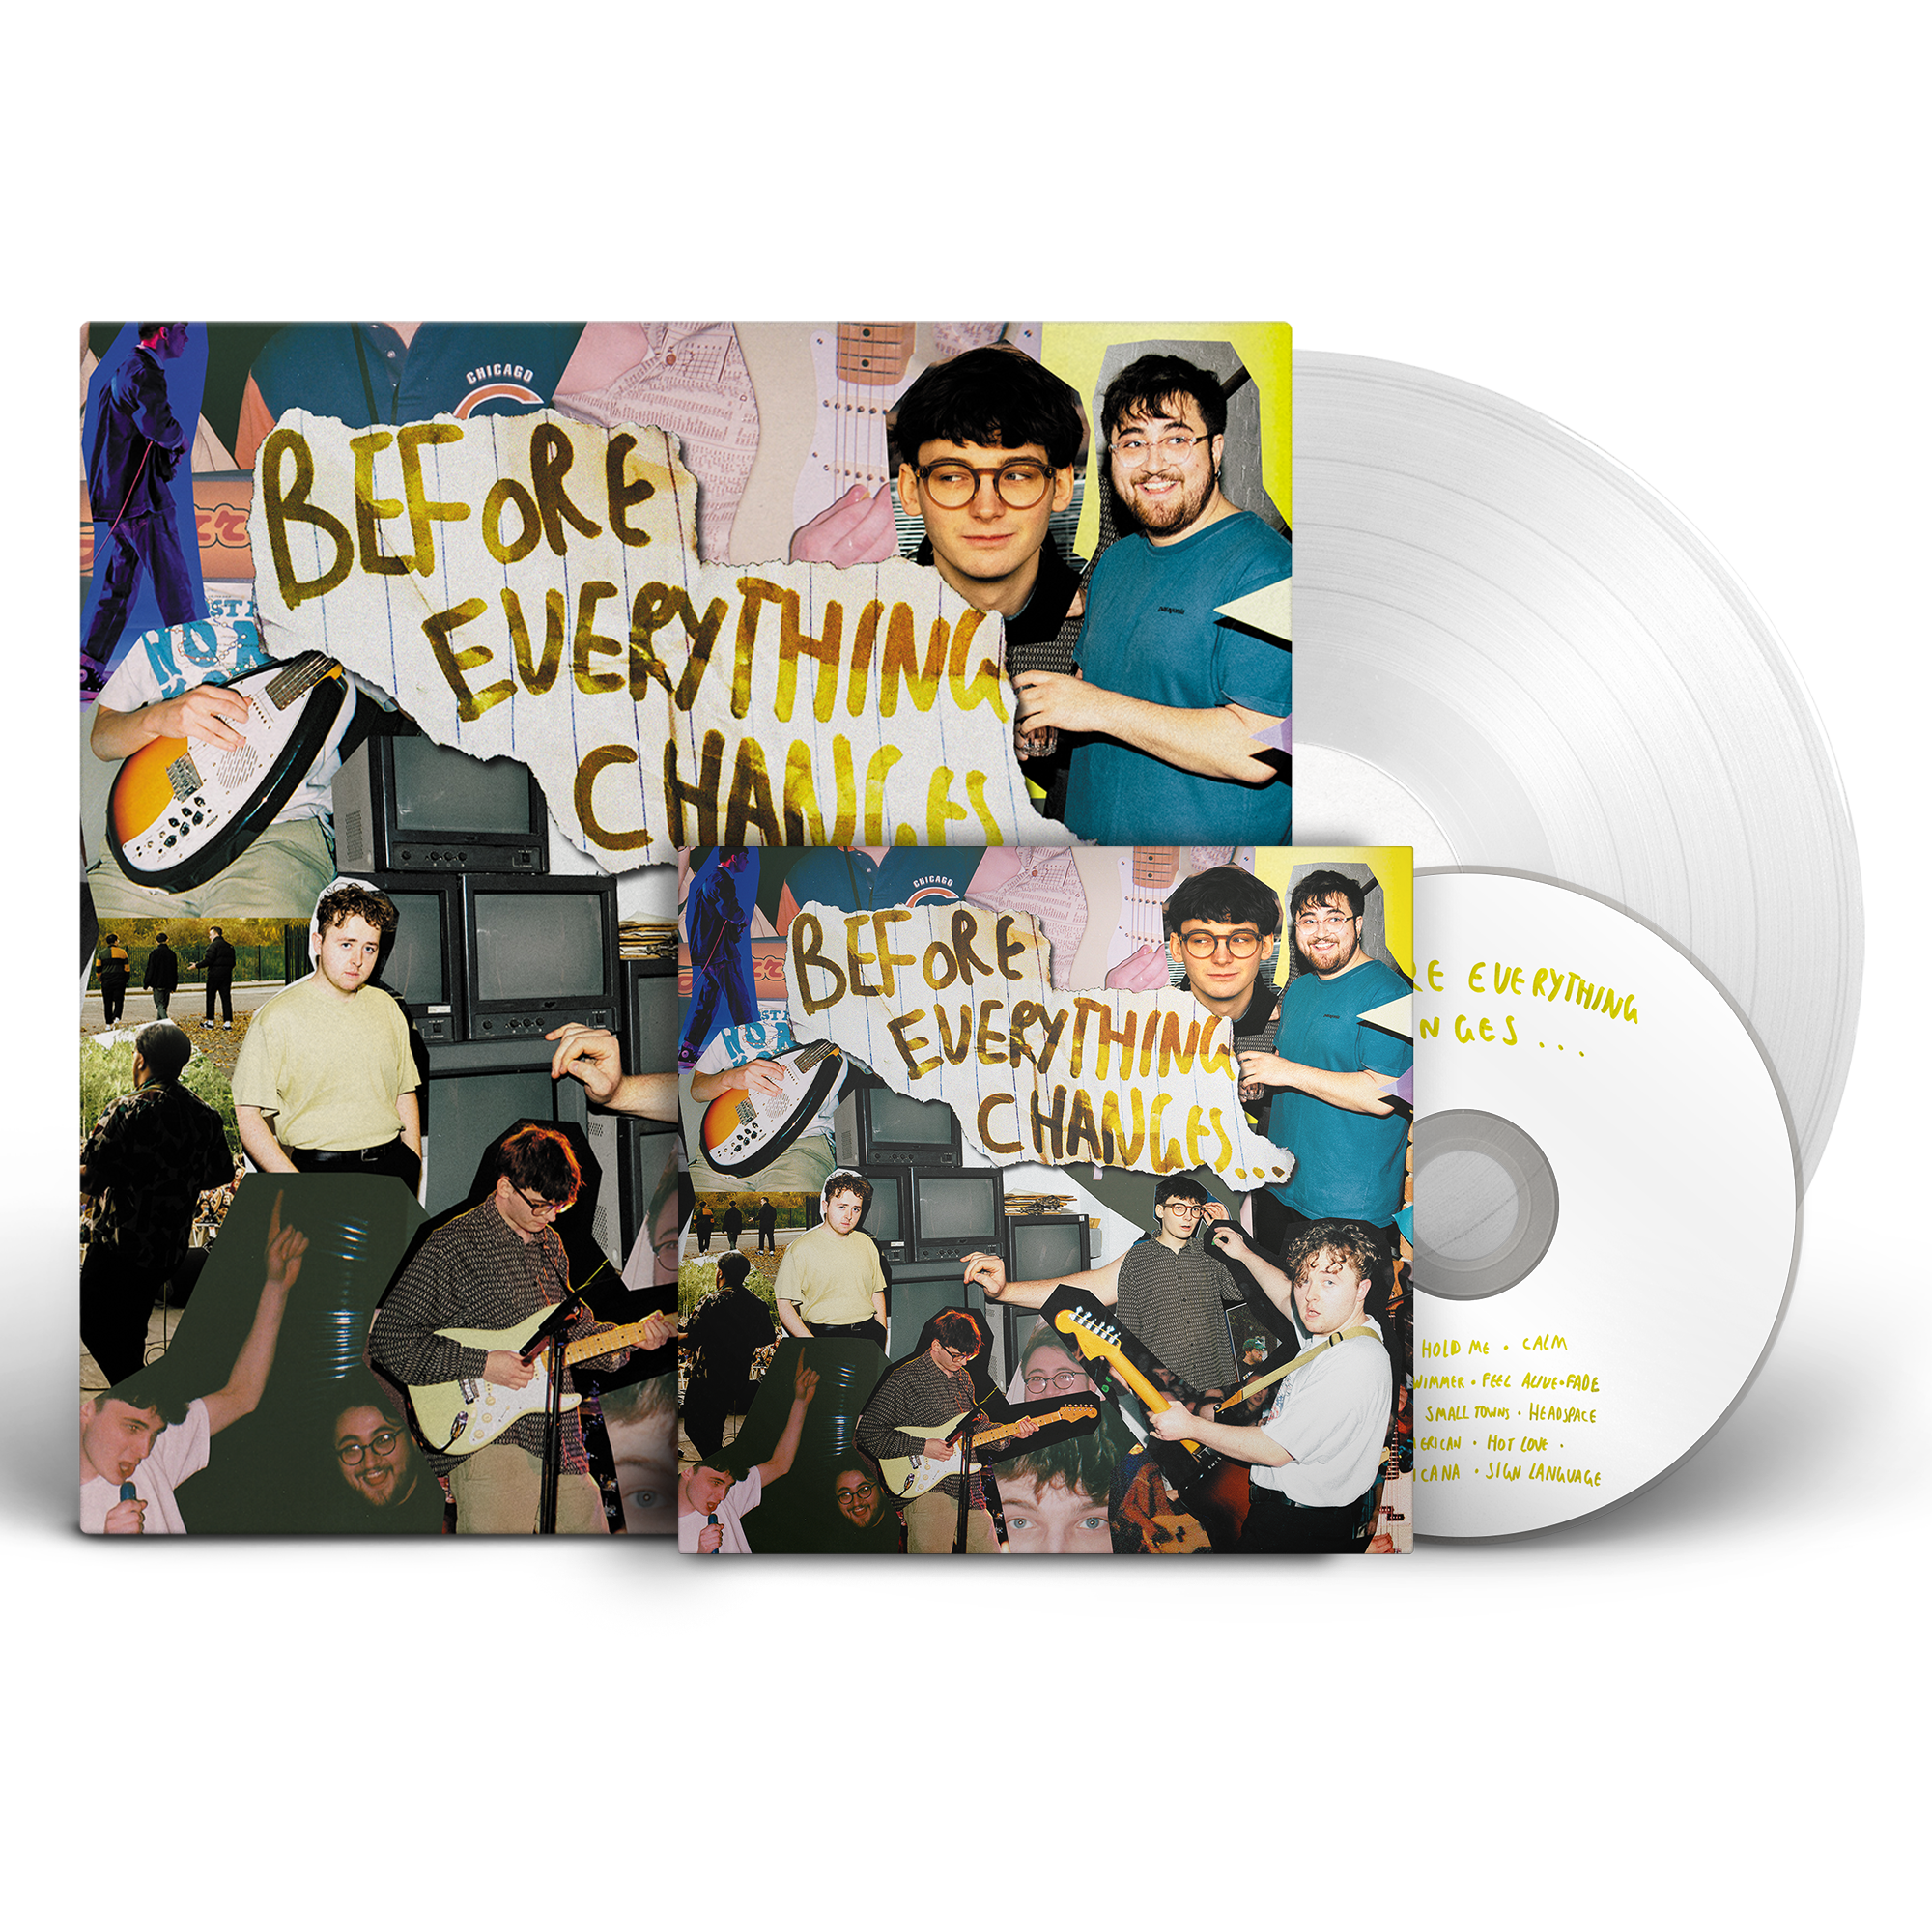 Vinyl + CD